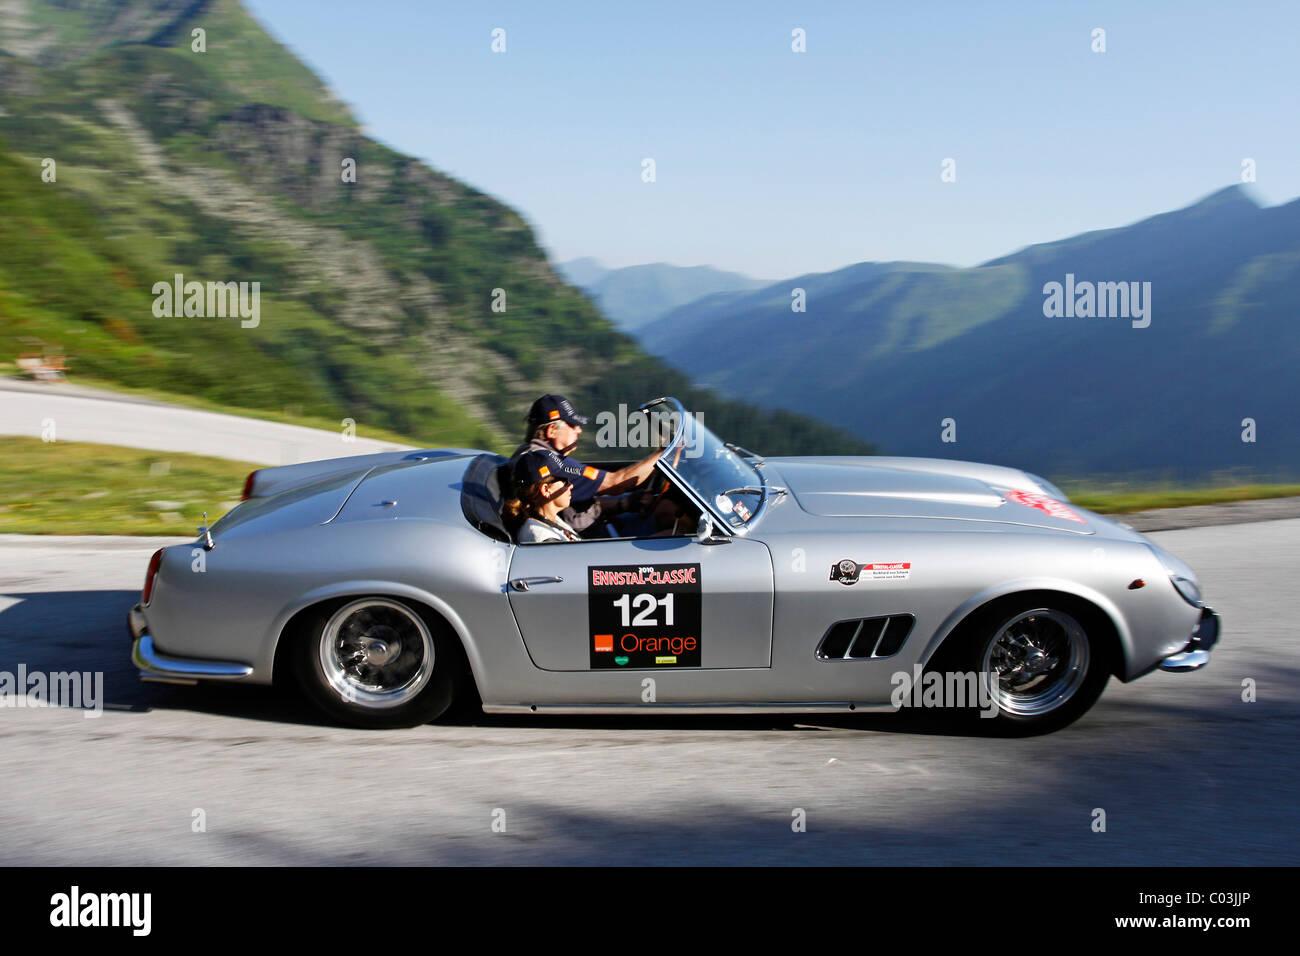 Ferrari 250 Gt Swb California Spyder Built In 1961 One Of The Most